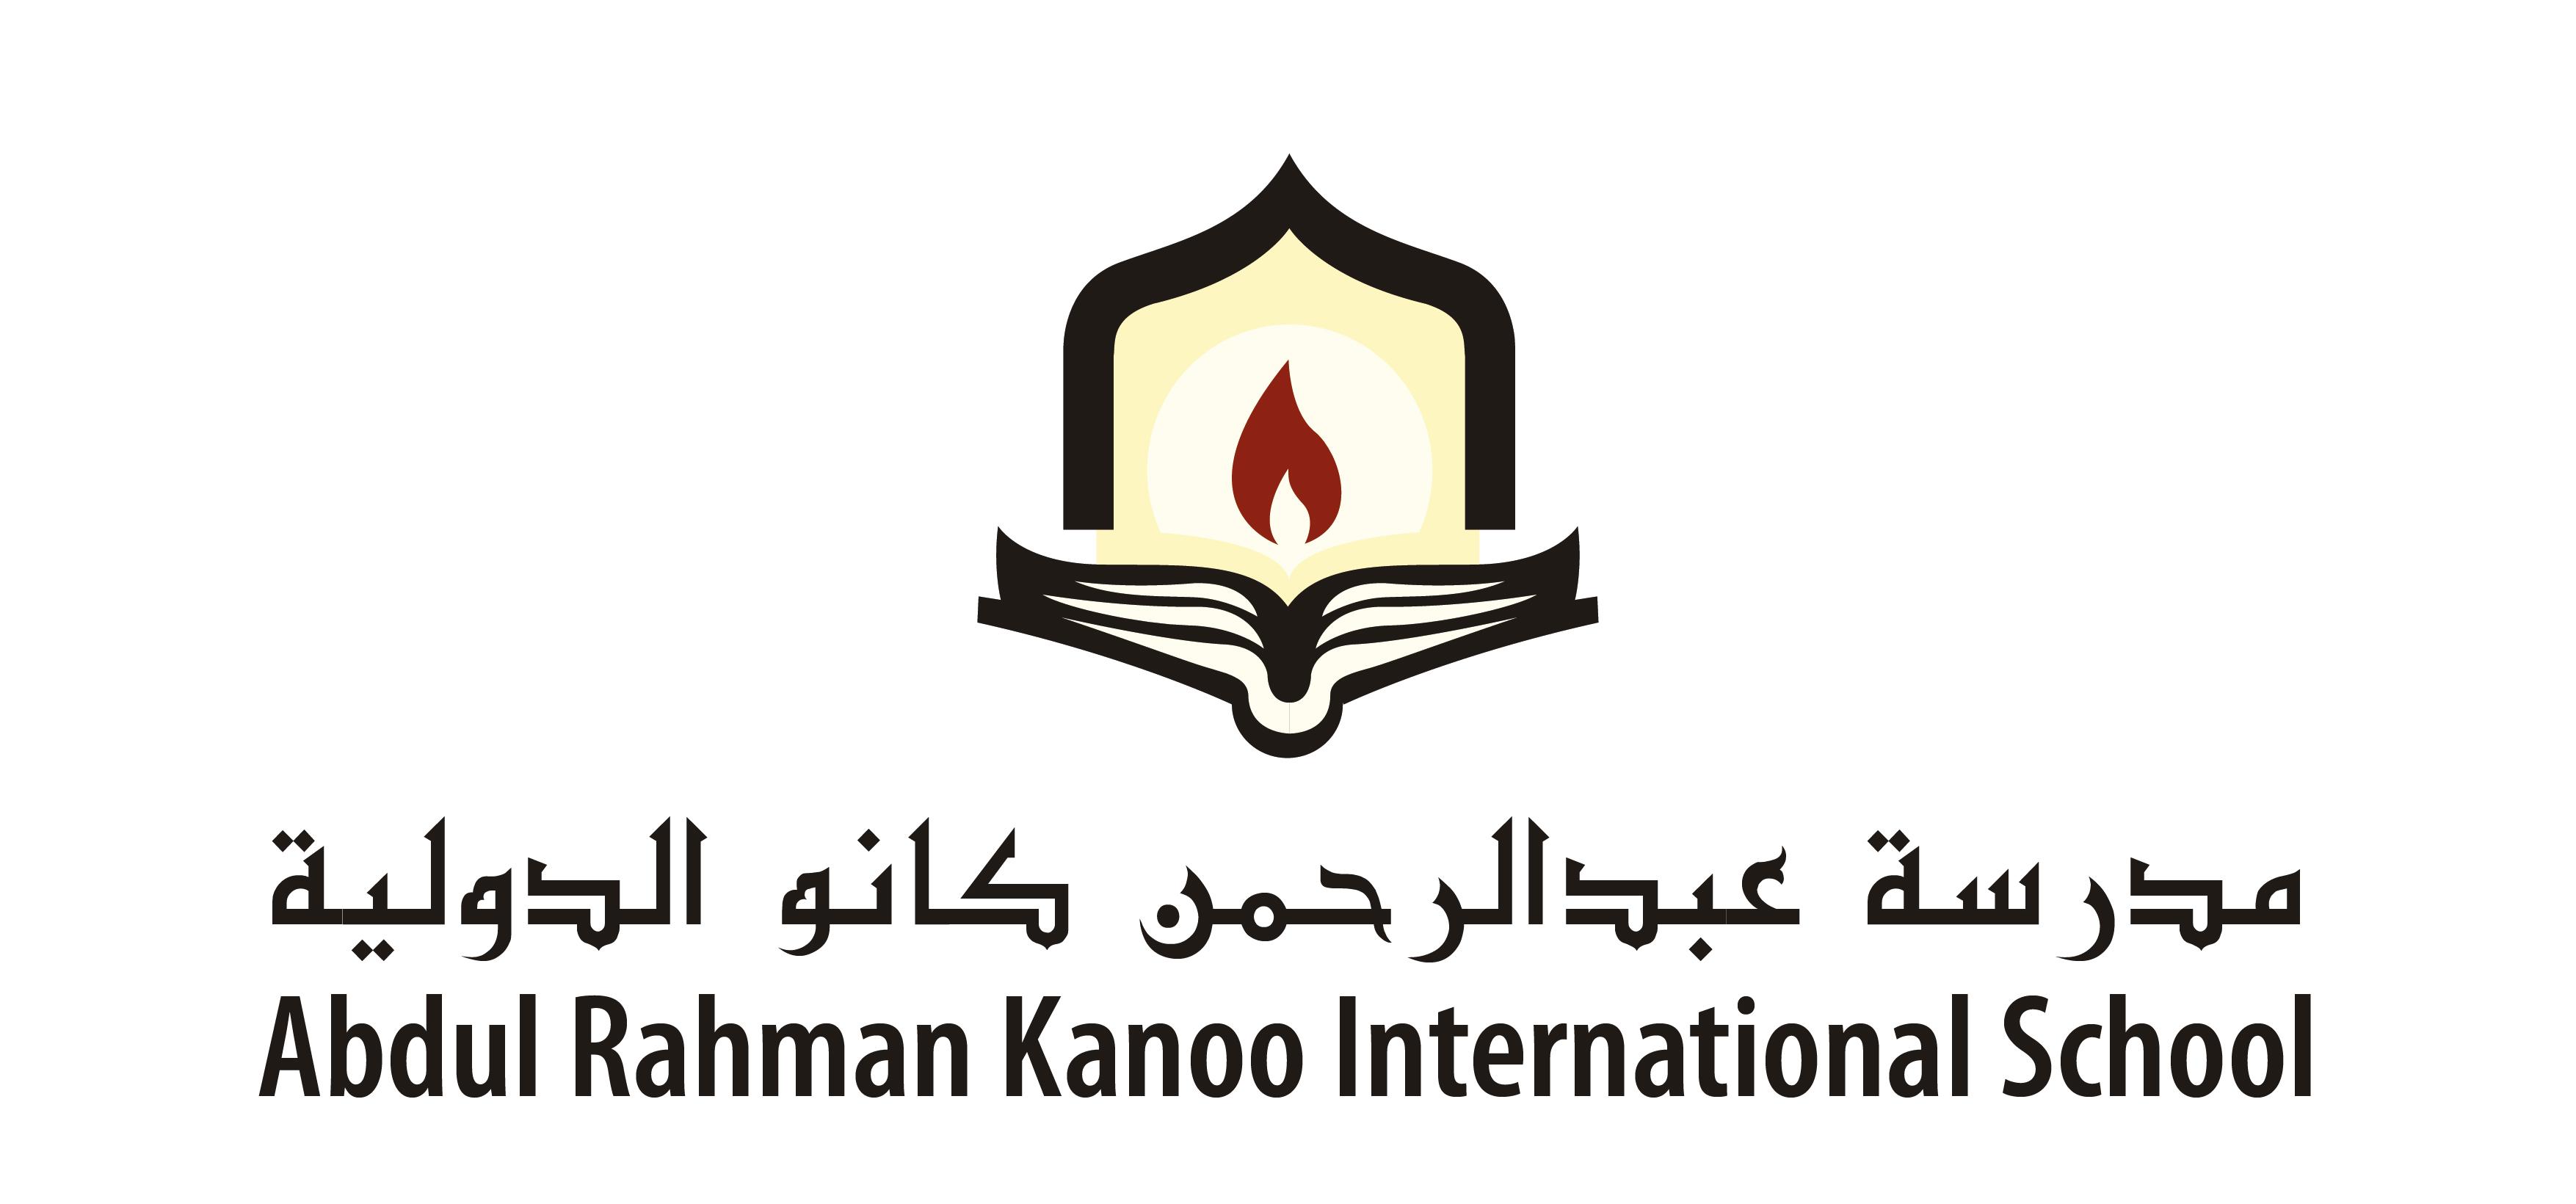 Logo of Abdulrahman Kanoo International School.jpg